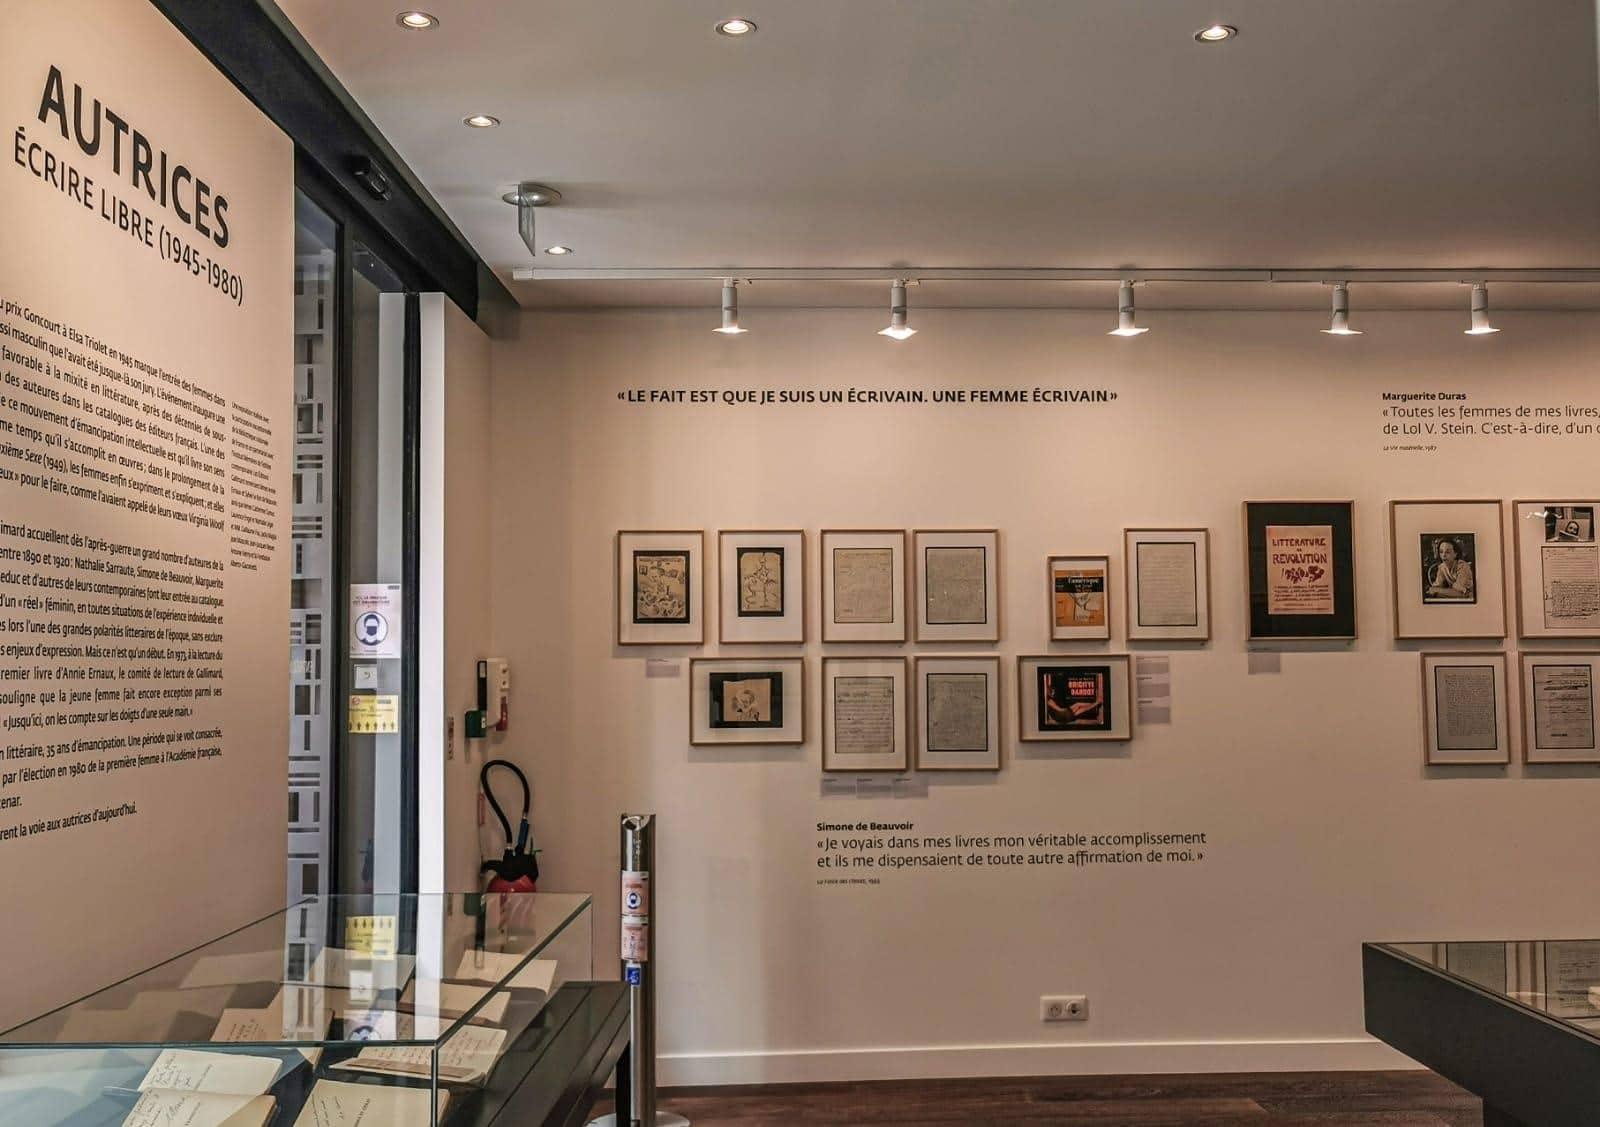 galerie gallimard exposition paris autrices ecrire libre